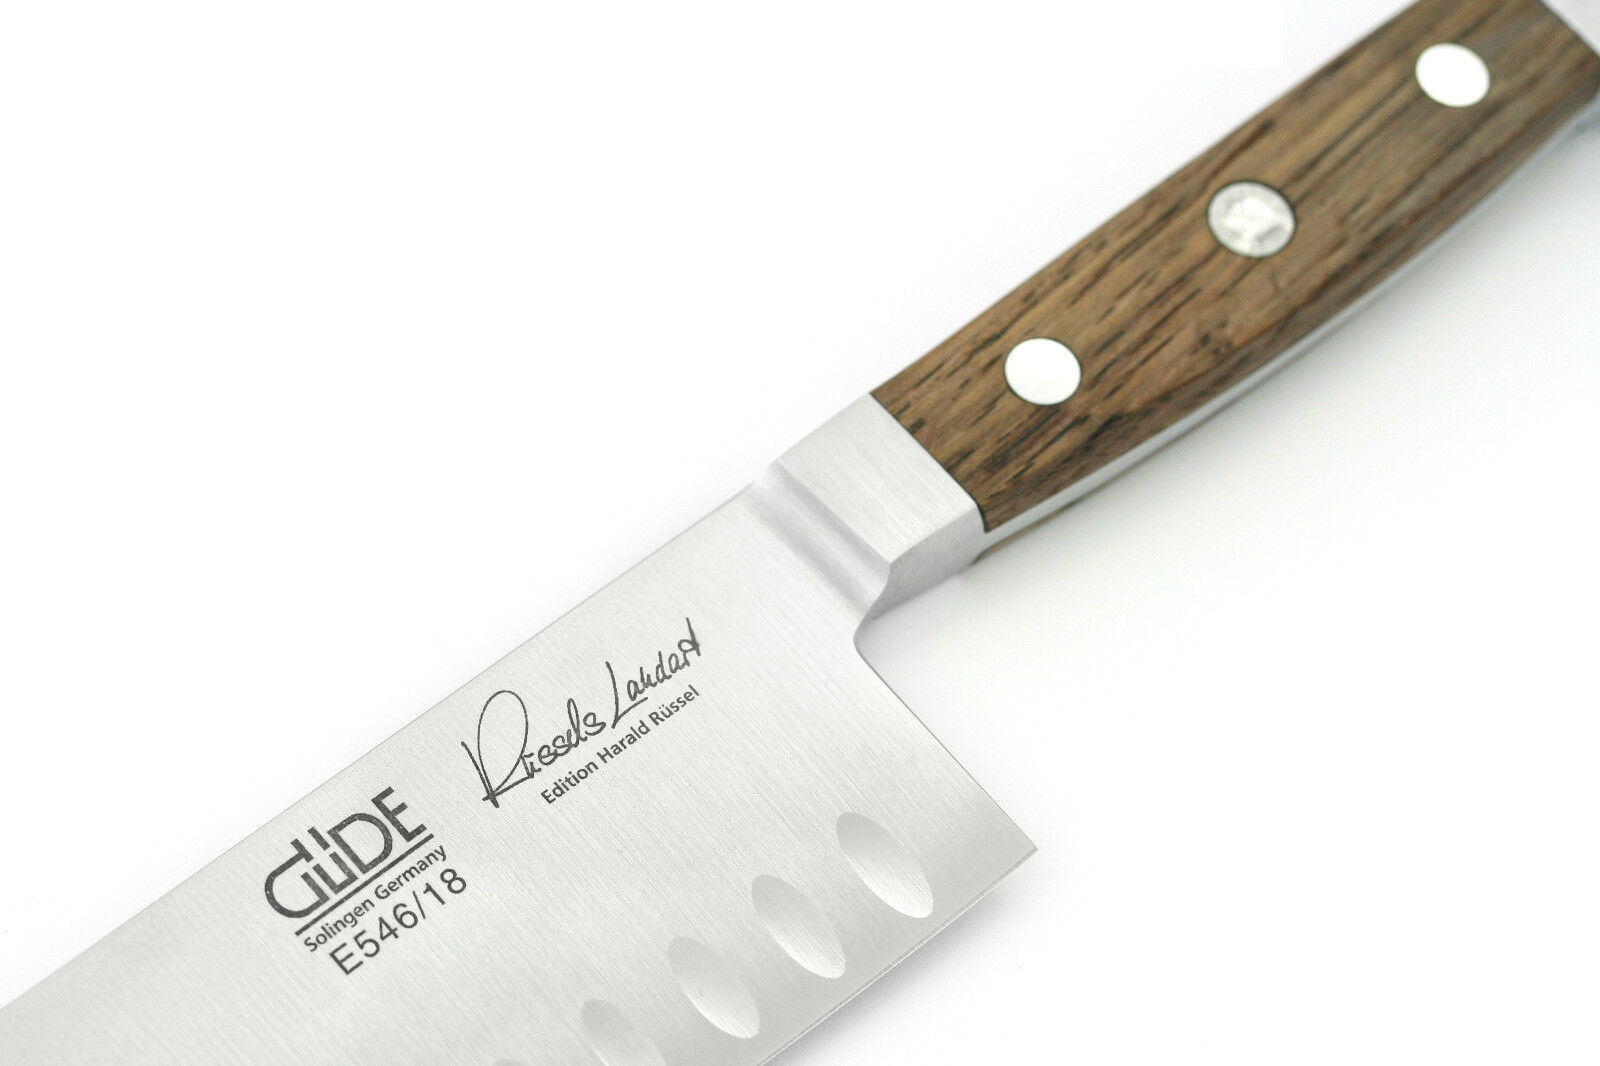 Santoku Kulle Güde Alpha fasseiche premium couteau e546 18